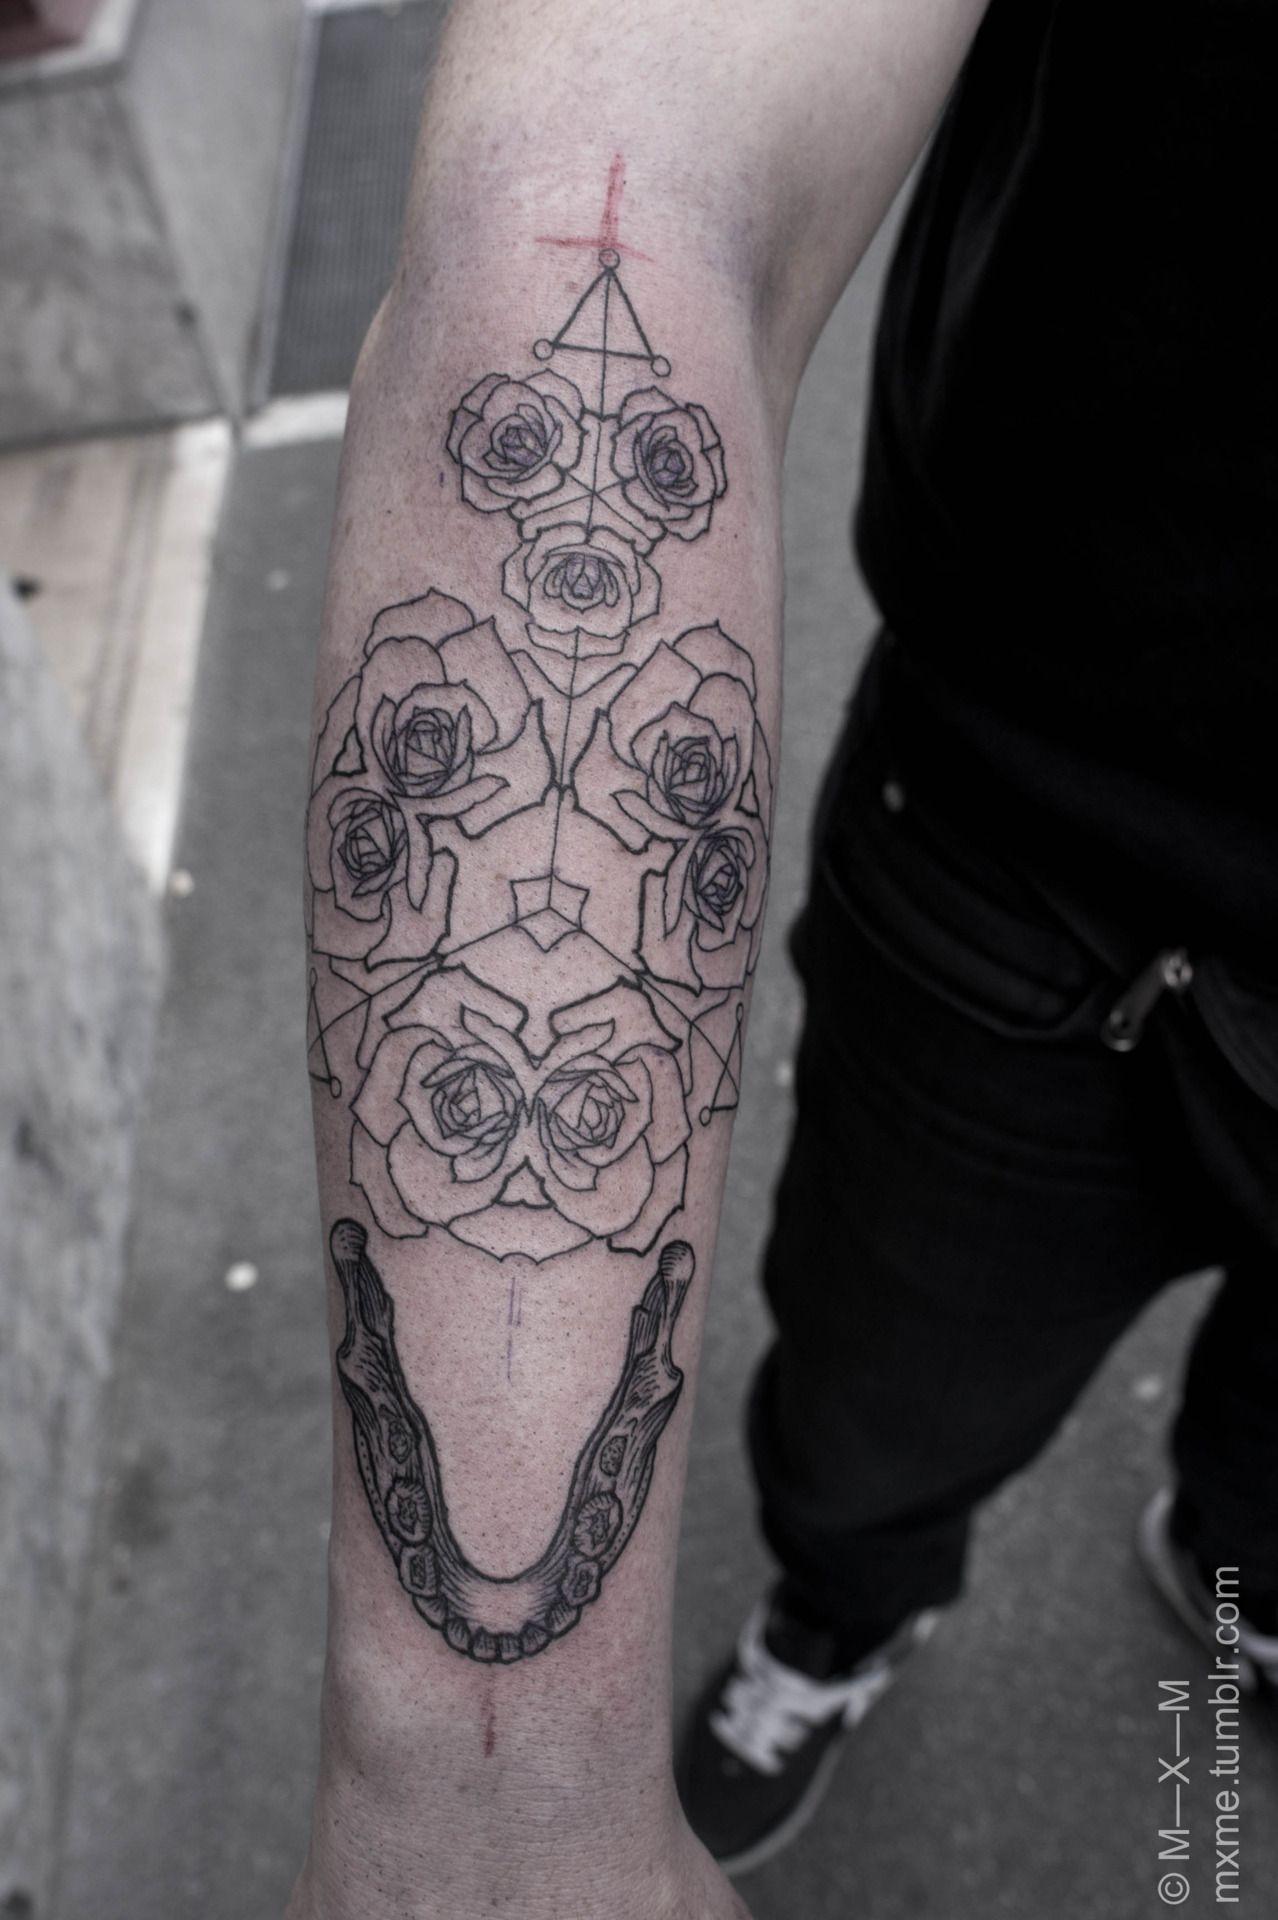 Jaw Drop Girl Tattoo Roses: Kaleidoscopic Roses And Teeth